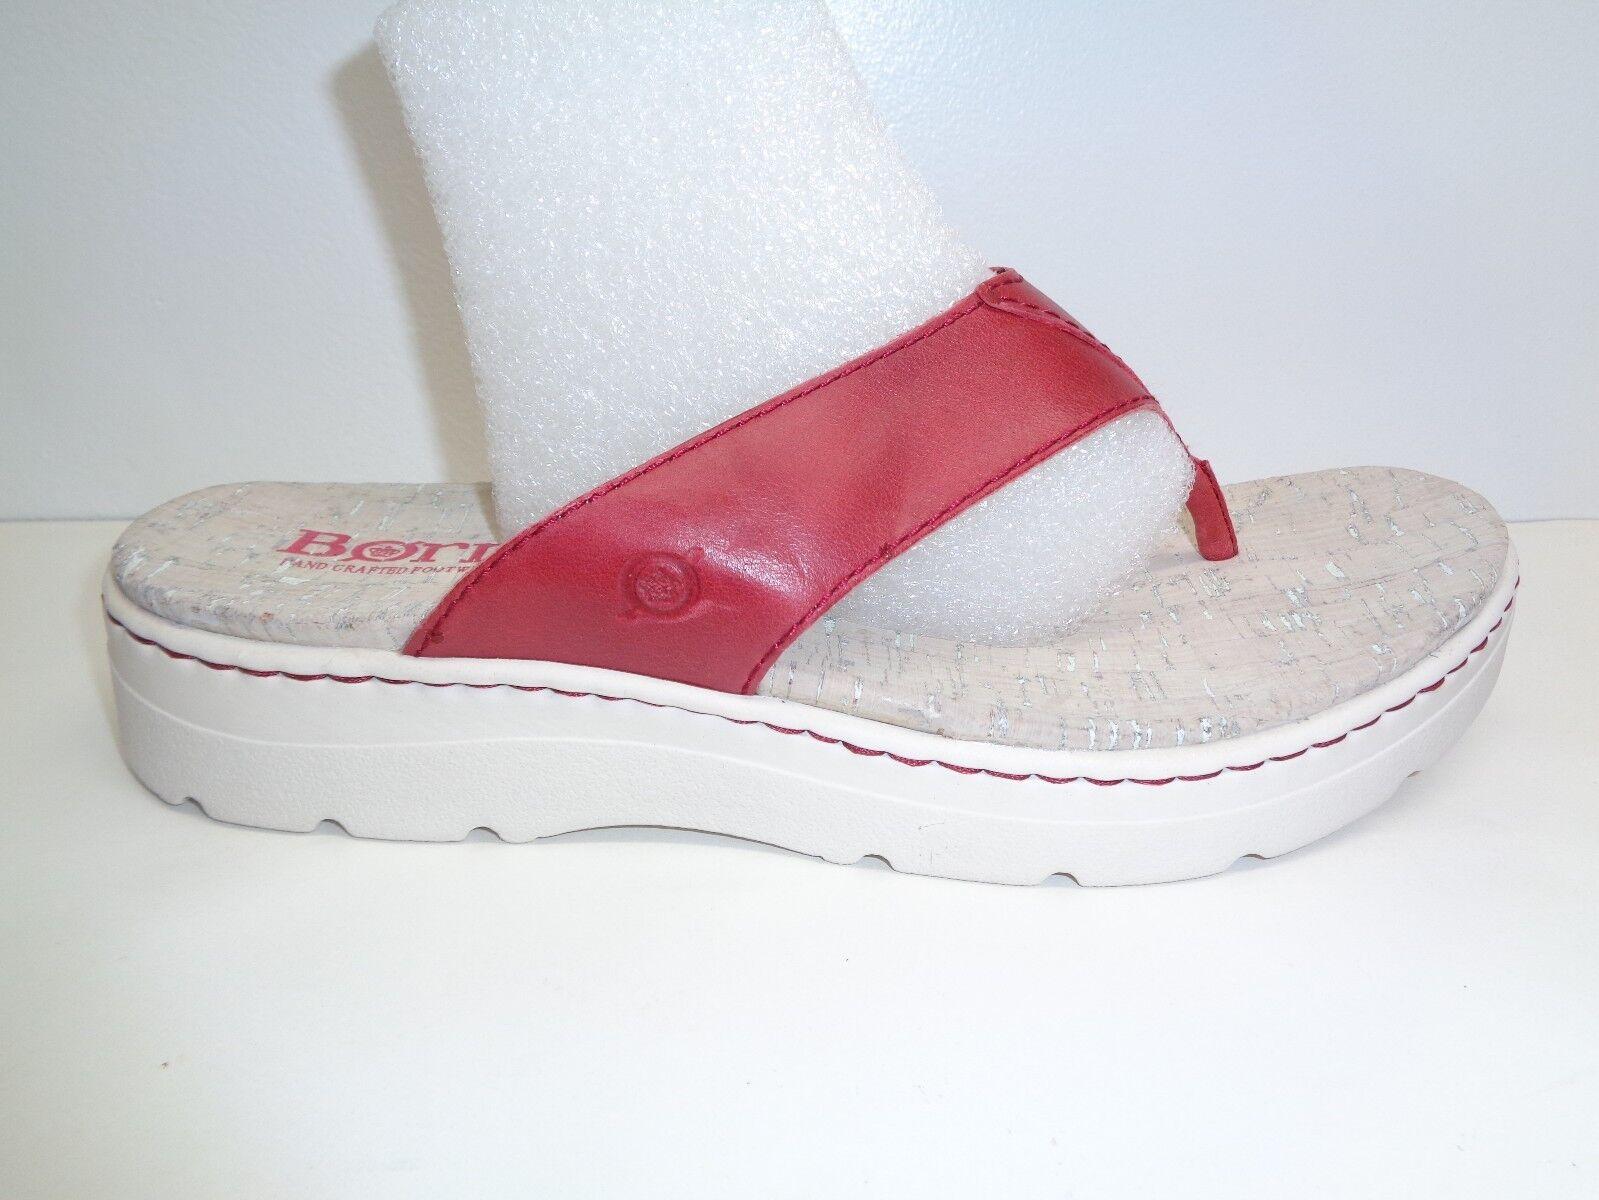 Born Size 11 M BERMUDA Red Pelle Thongs Platform Sandals New Donna Shoes